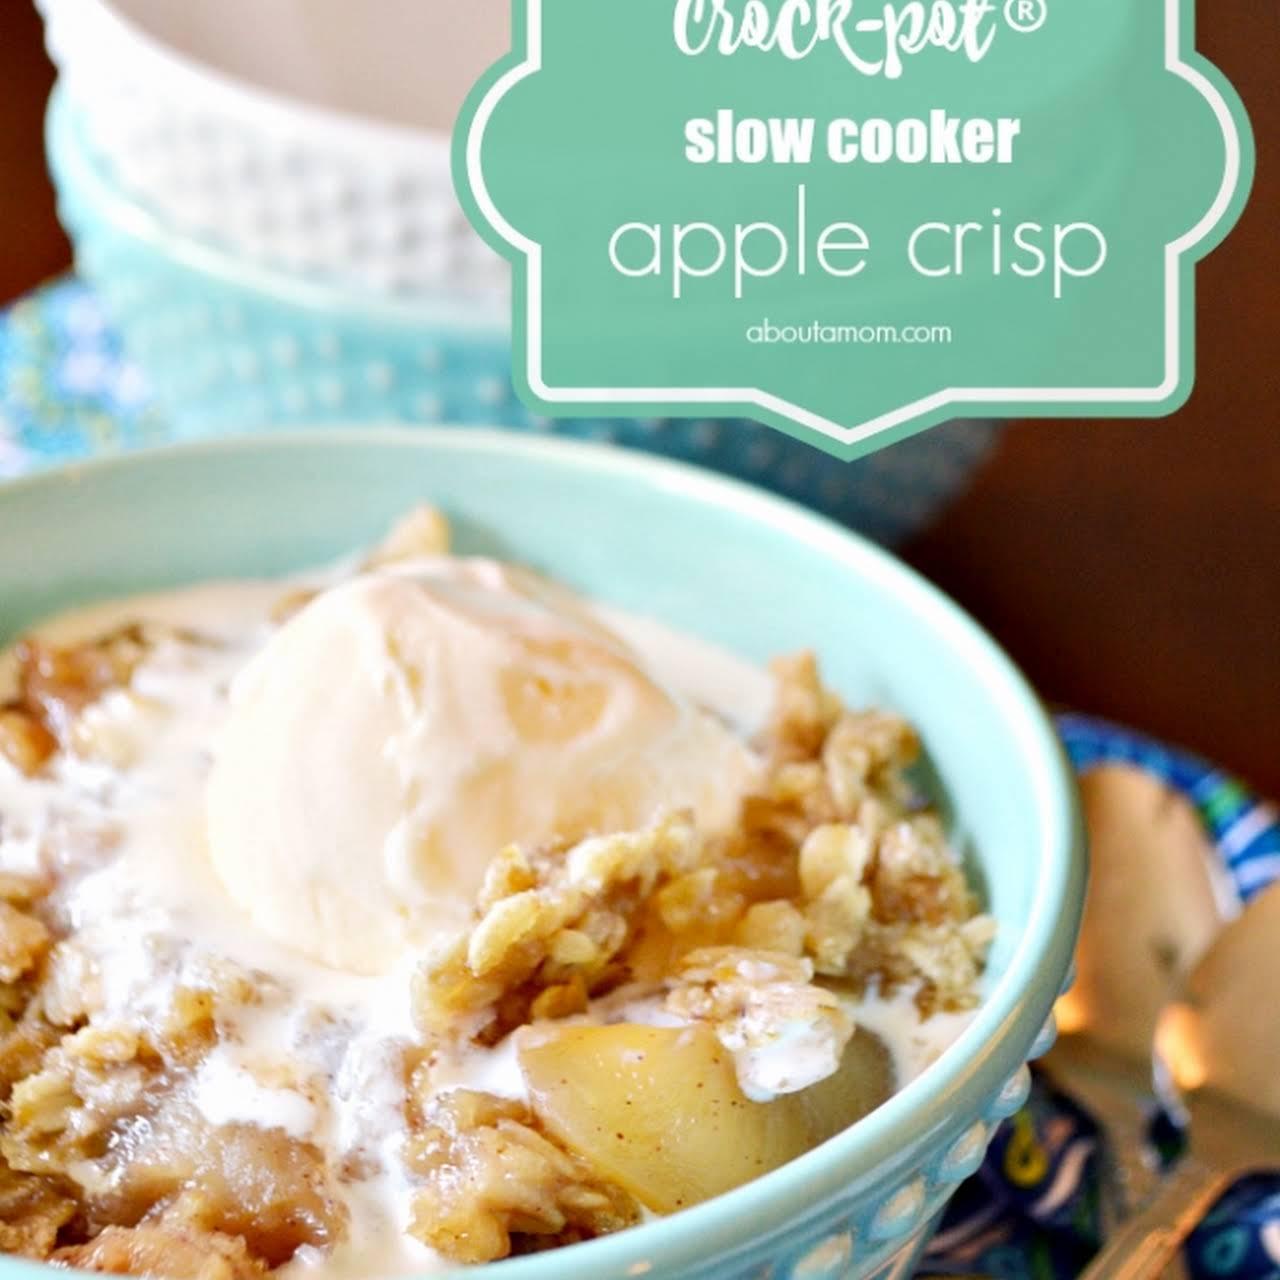 Crock-Pot® Slow Cooker Apple Crisp